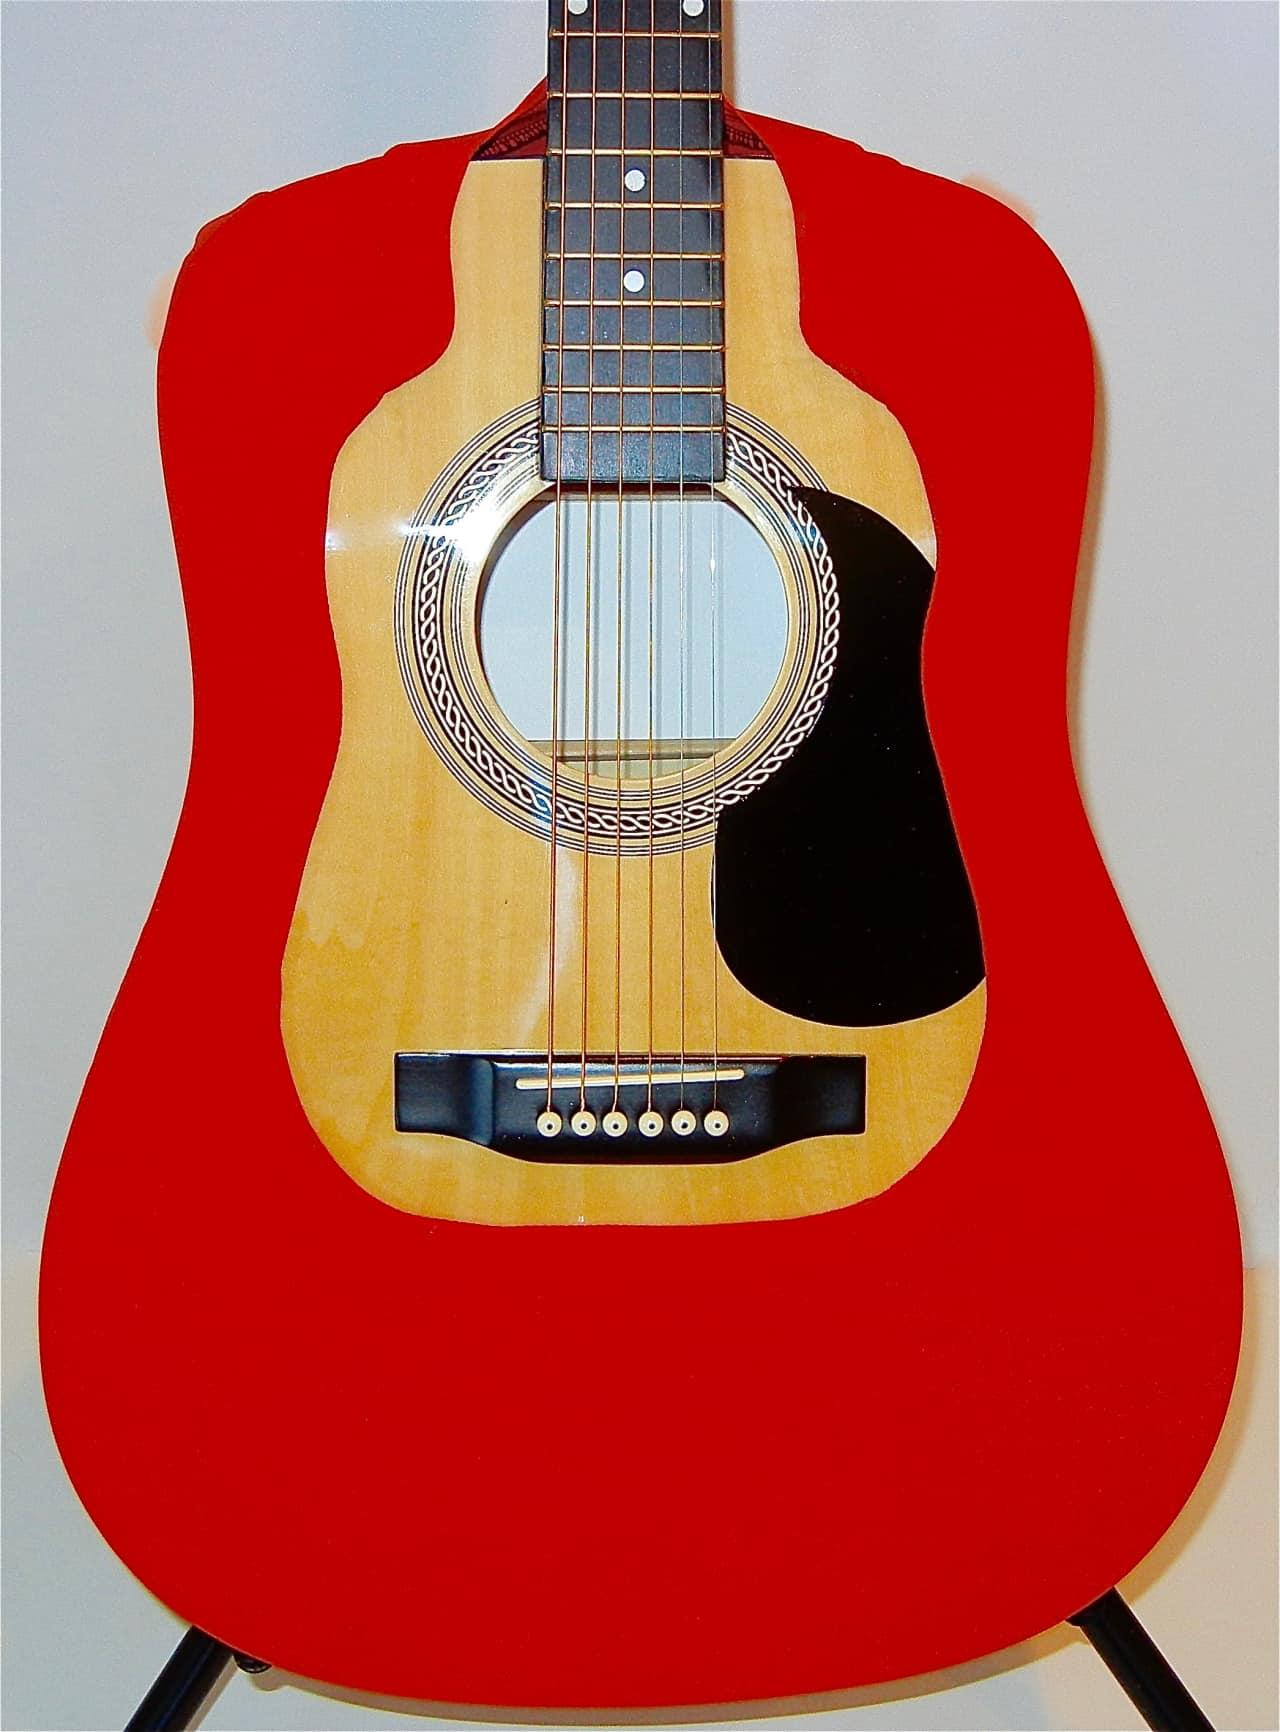 acoustic guitar cover vest red dreadnought fits martin reverb. Black Bedroom Furniture Sets. Home Design Ideas